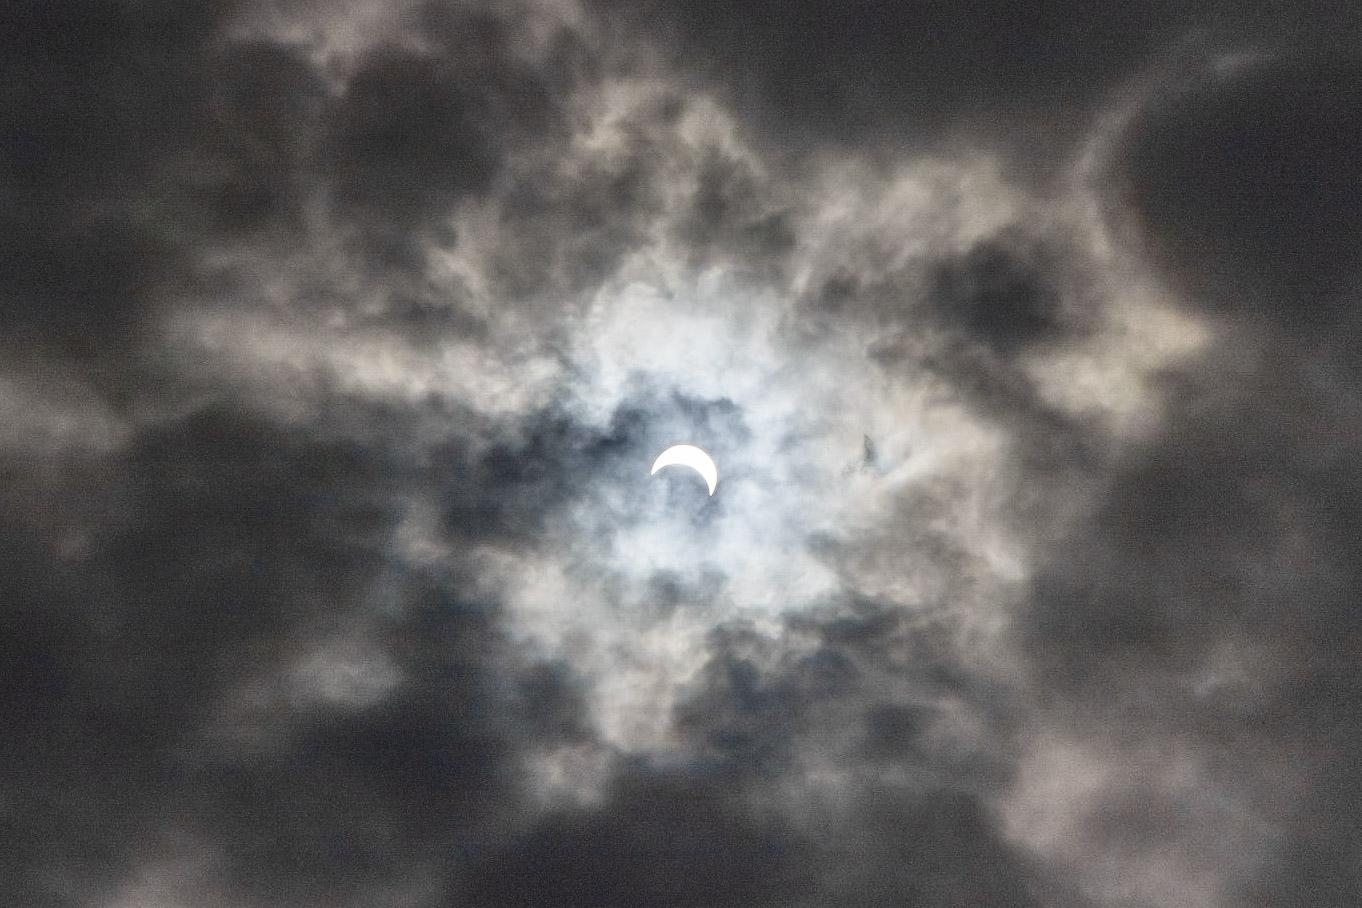 Eclipse-08-21-2017—Chris-Page-Art-33.jpg